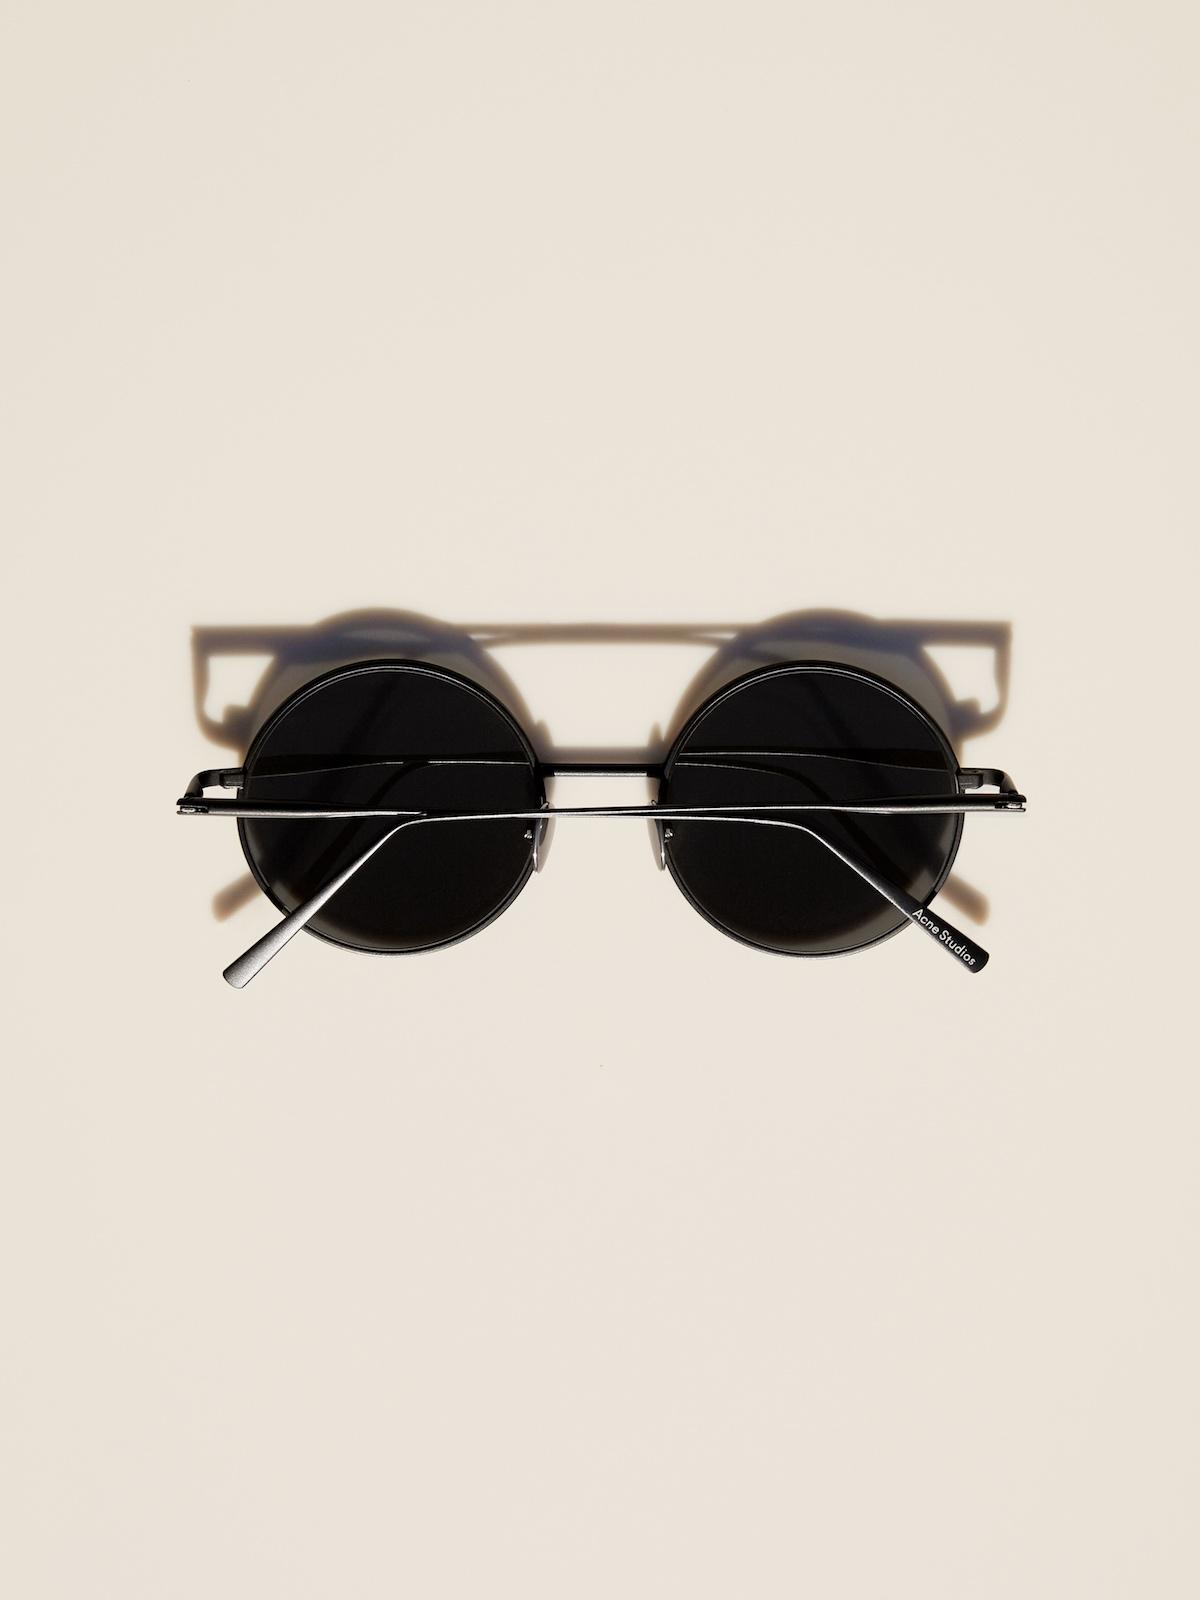 Acne Studios' 'Scientist' frames